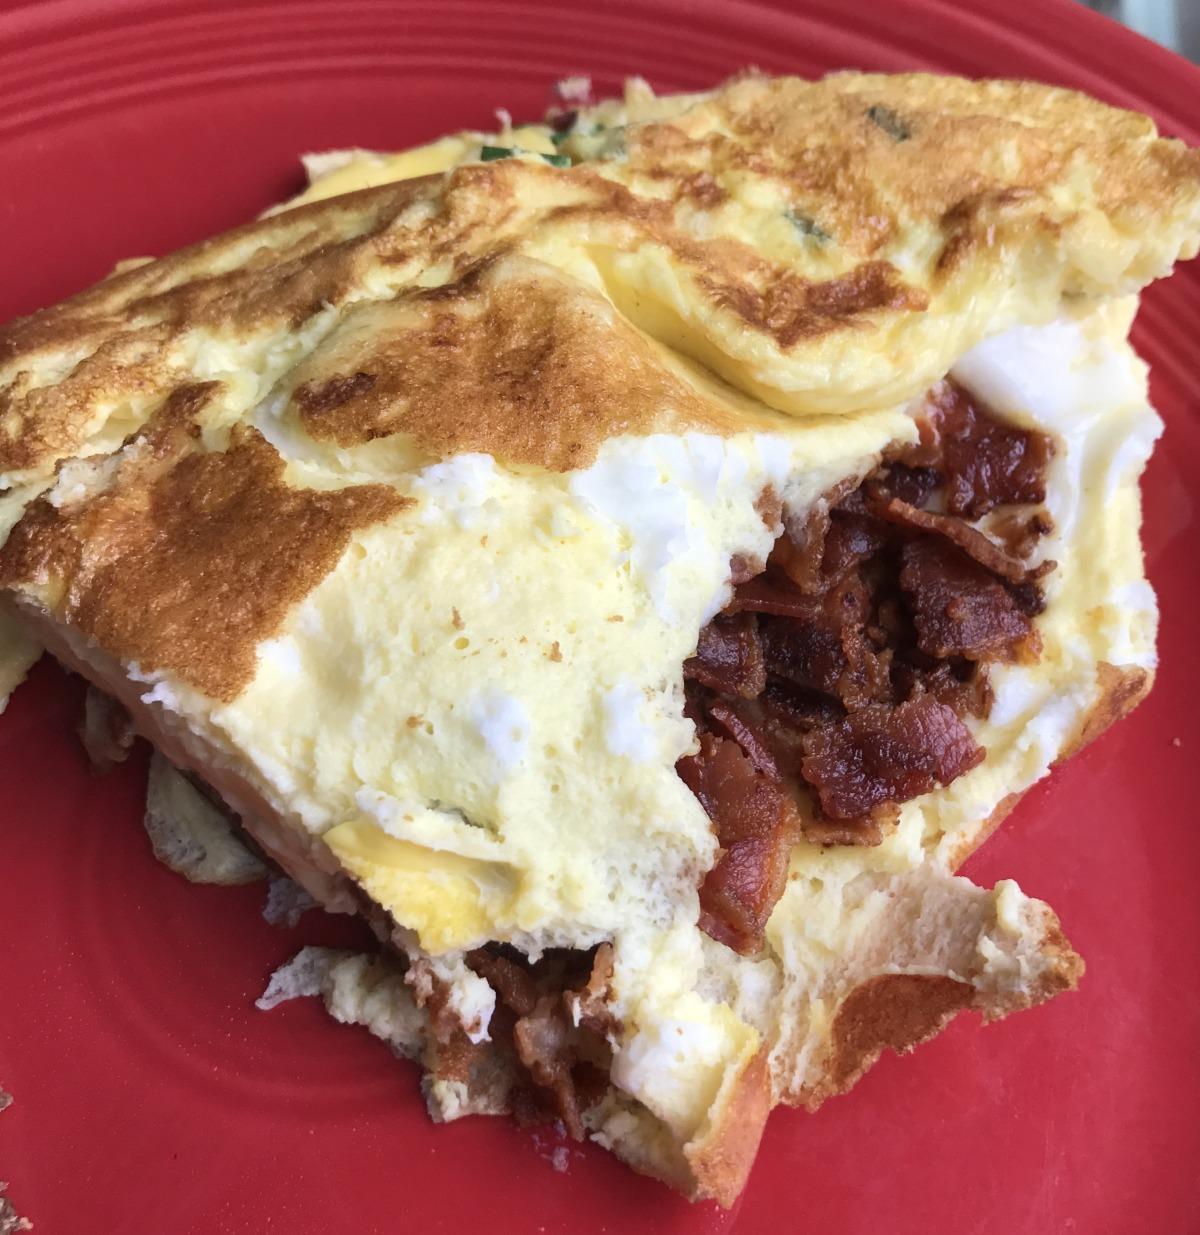 Flaeskeaeggekage (Danish Bacon & Egg Pancake/Omelet) image